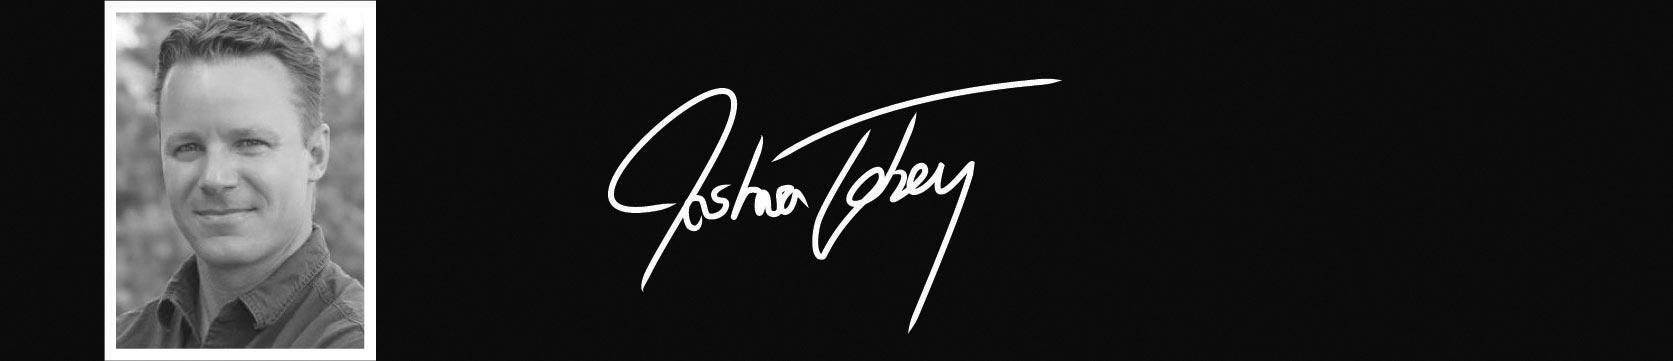 Joshua Tobey Artist